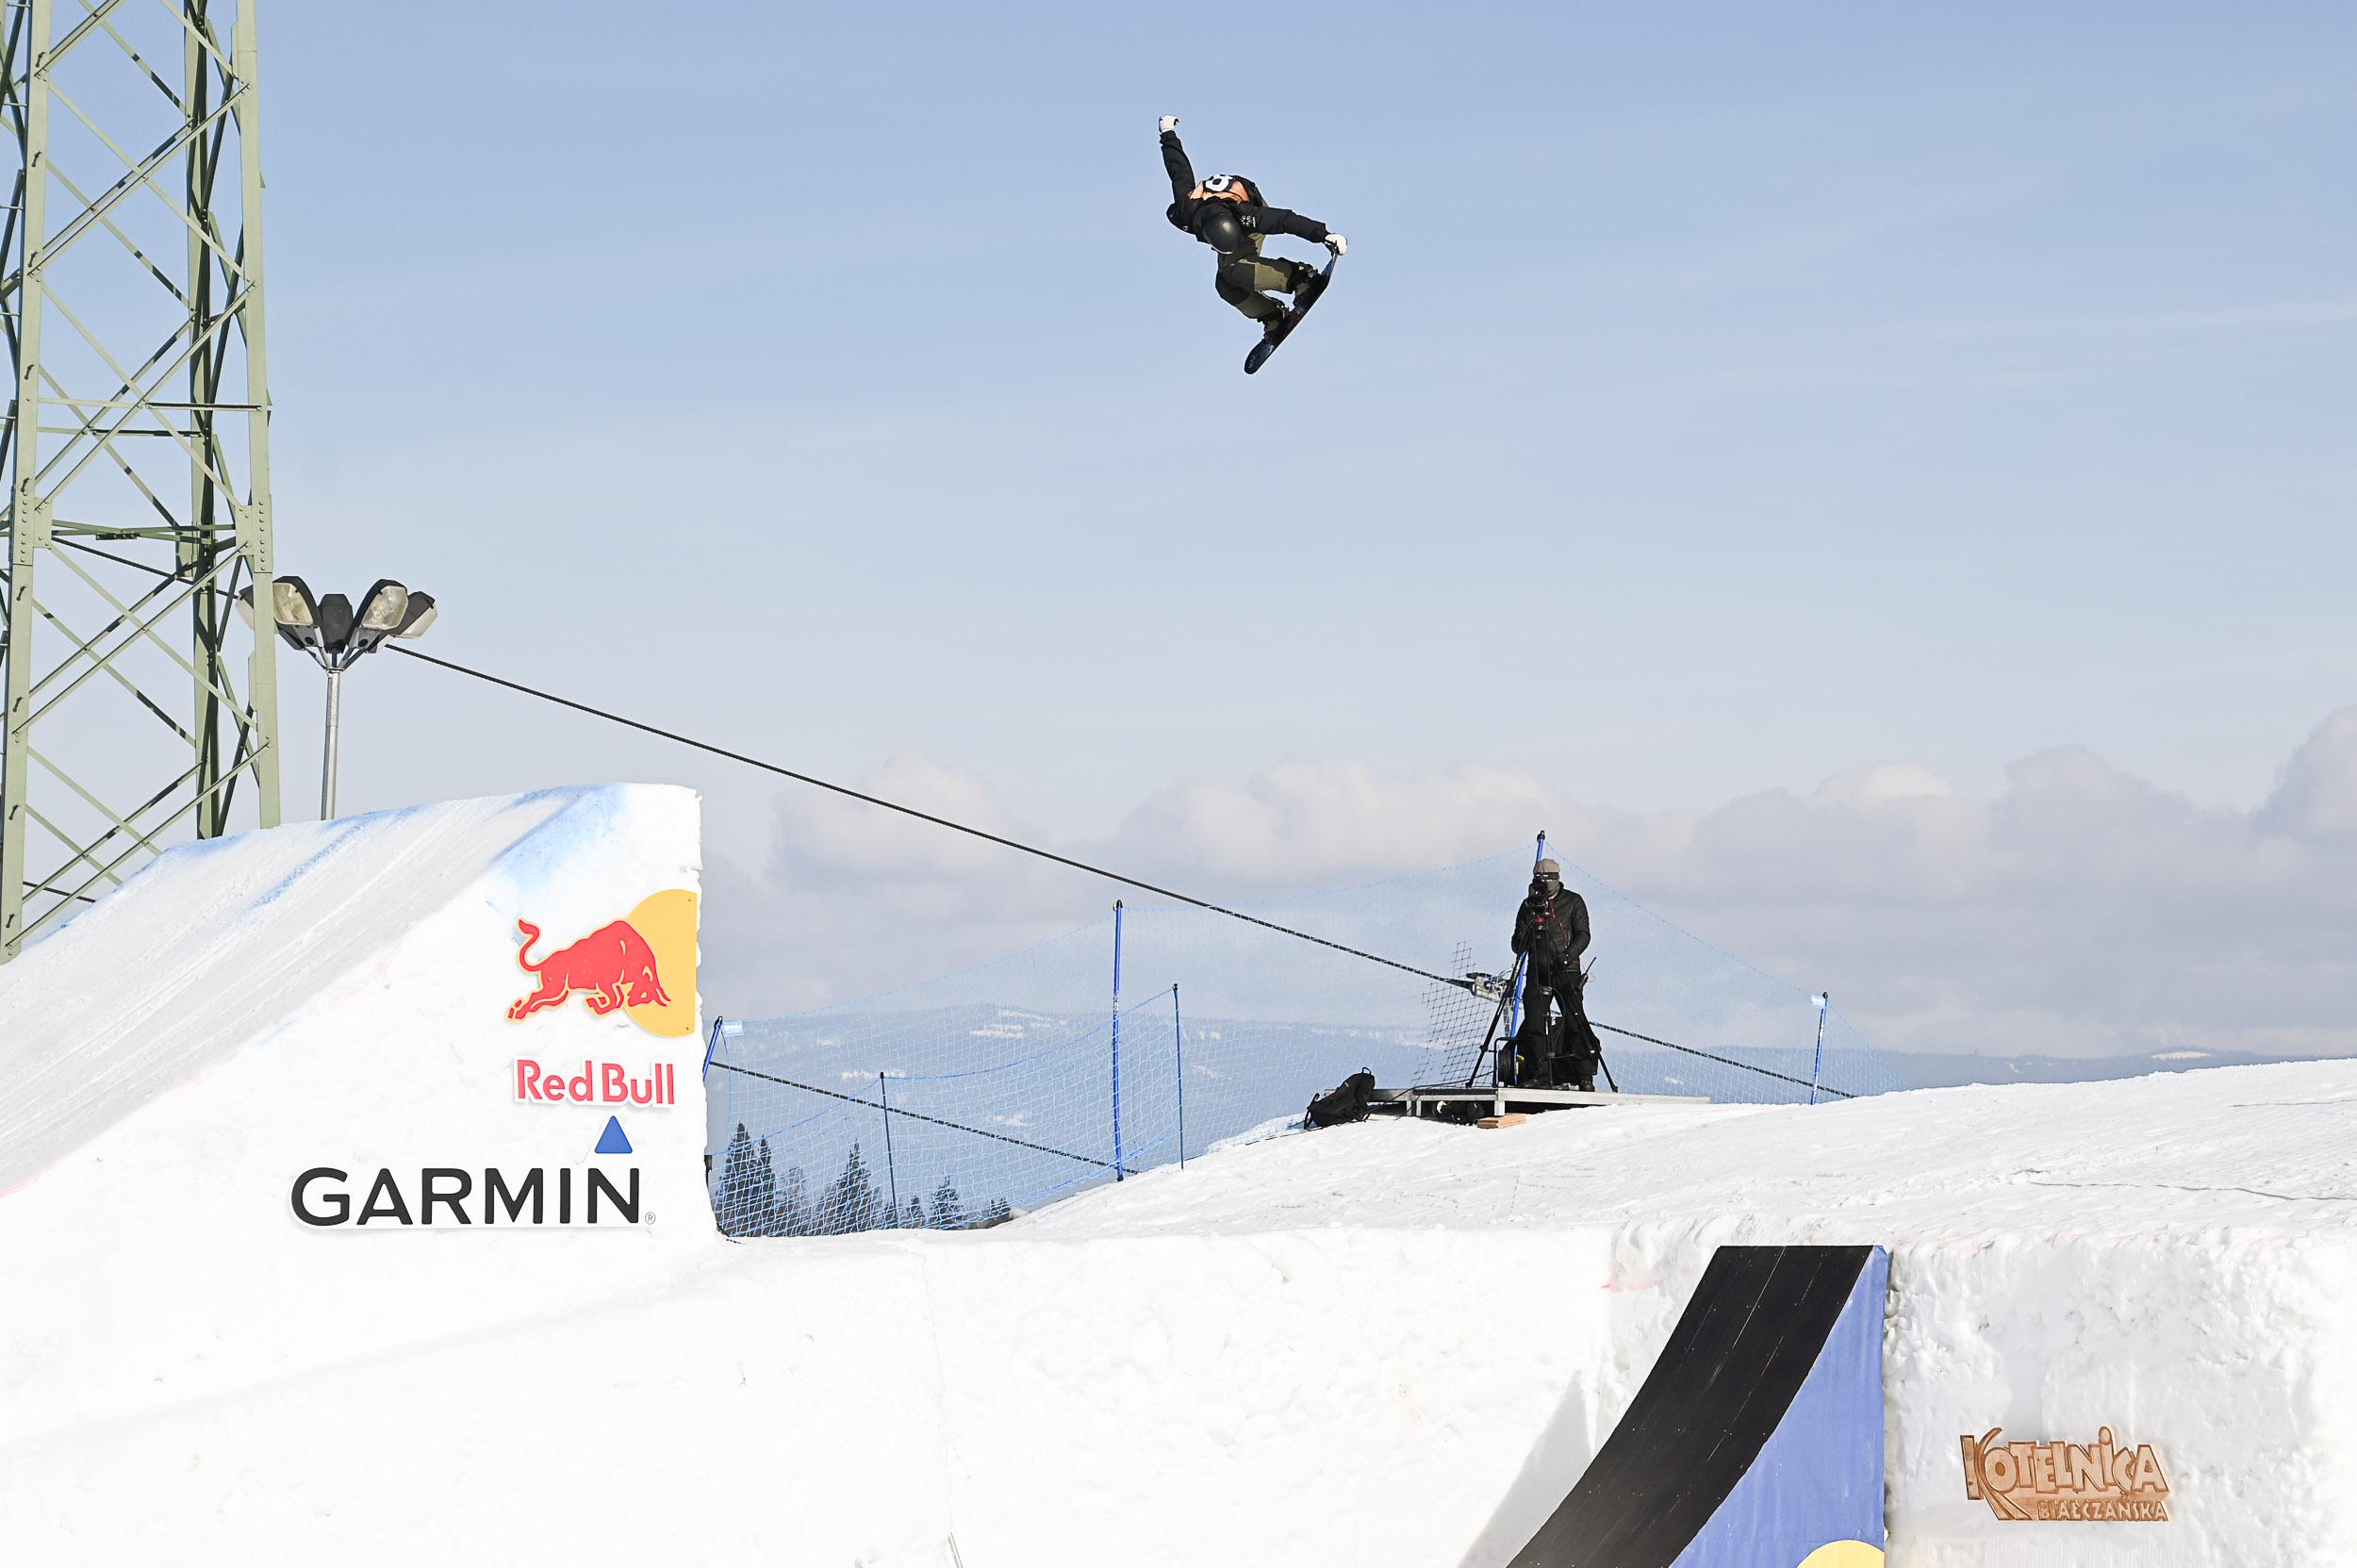 Garmin Winter Sports Festival 2020